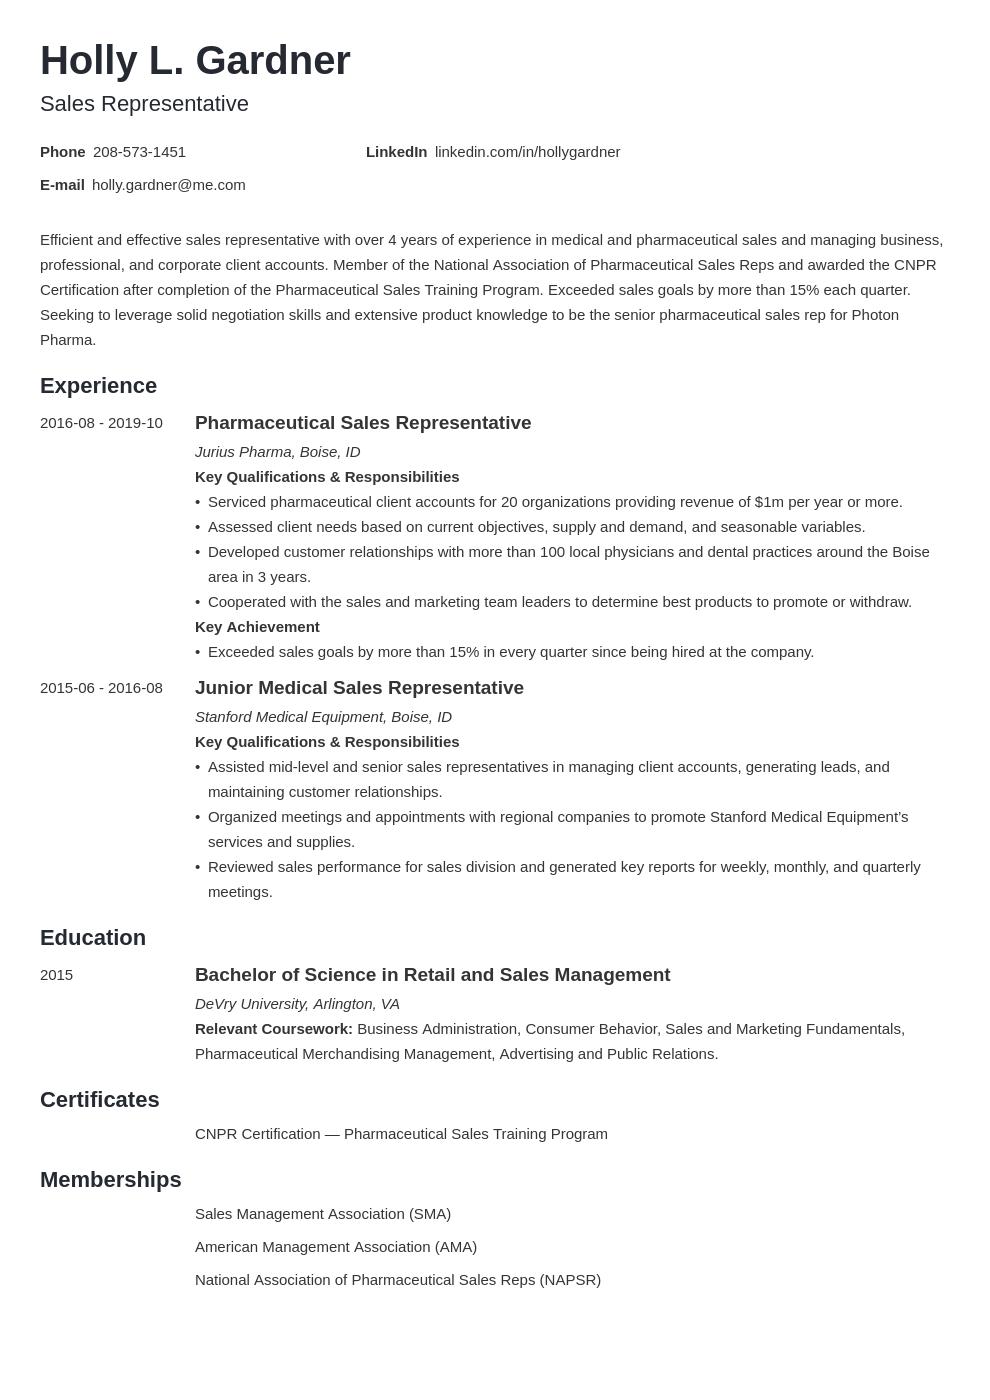 Sales Representative Resume Example Template Minimo Resume Examples Sales Resume Job Resume Examples